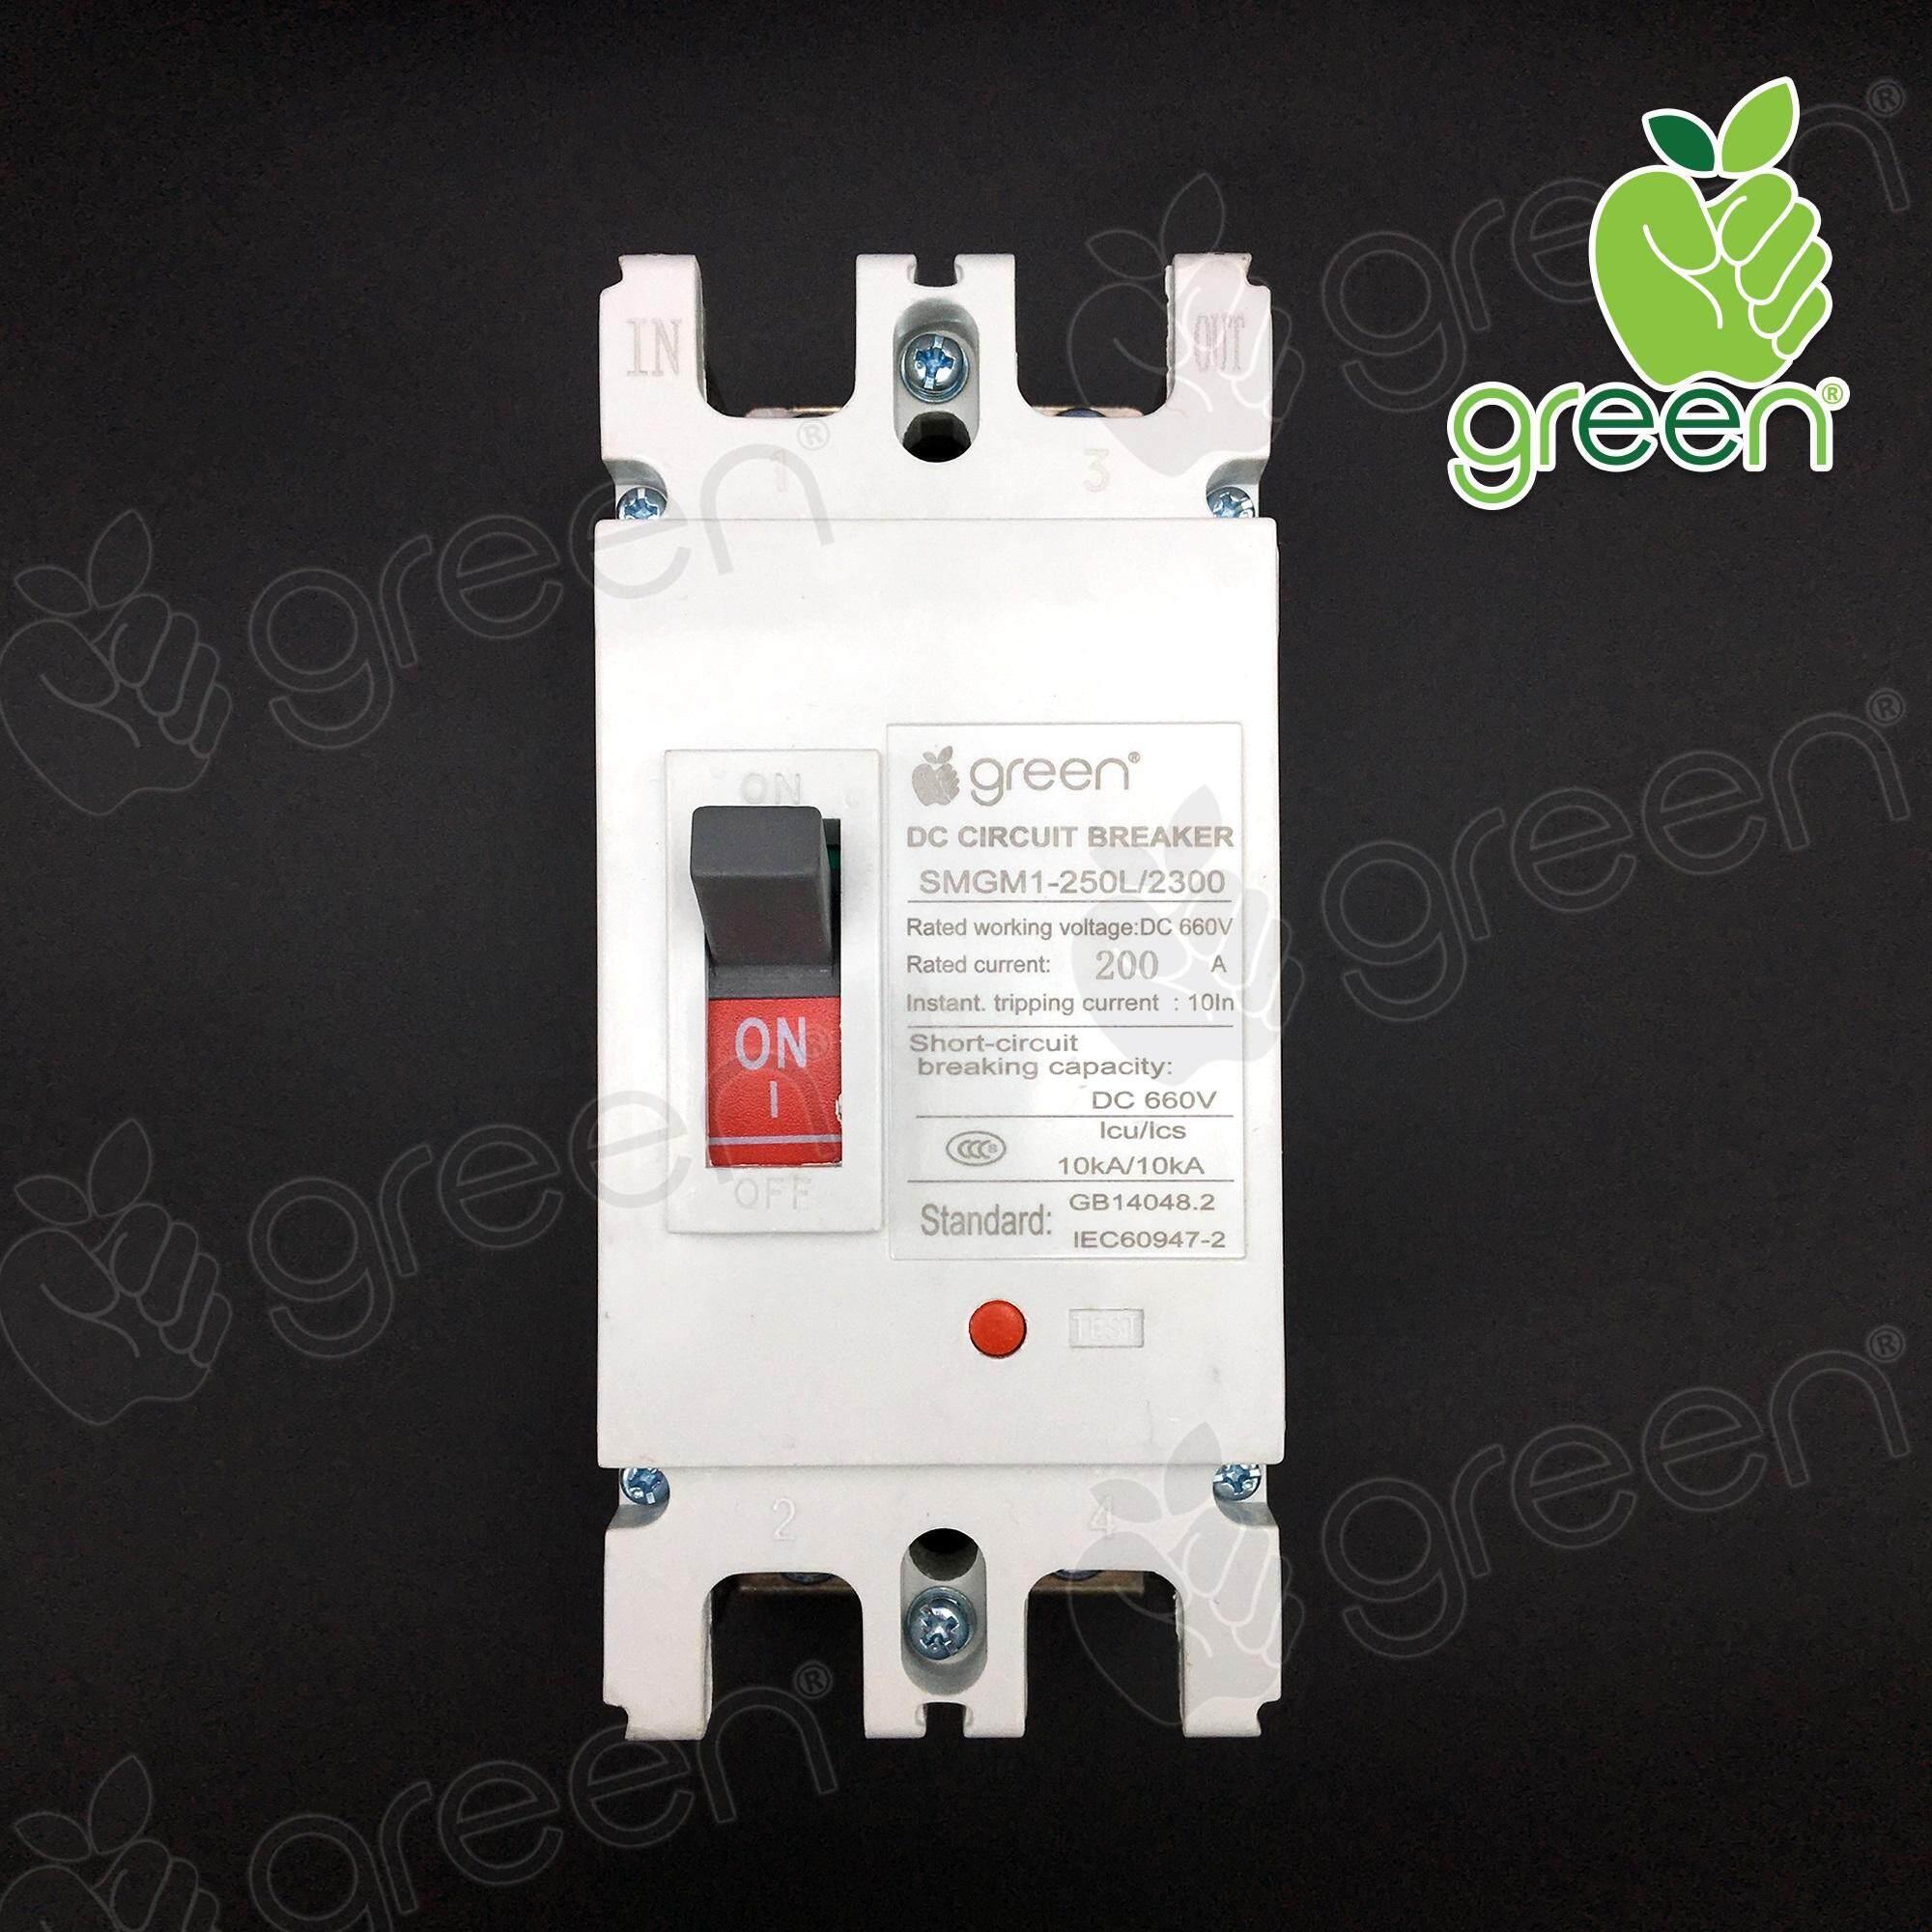 Applegreen Circuit DC Breaker 2P 200A 660V MCCB Solar cell เบรคเกอร์ไฟฟ้า ใช้กับไฟ DC ใช้กับระบบโซล่าเซลล์